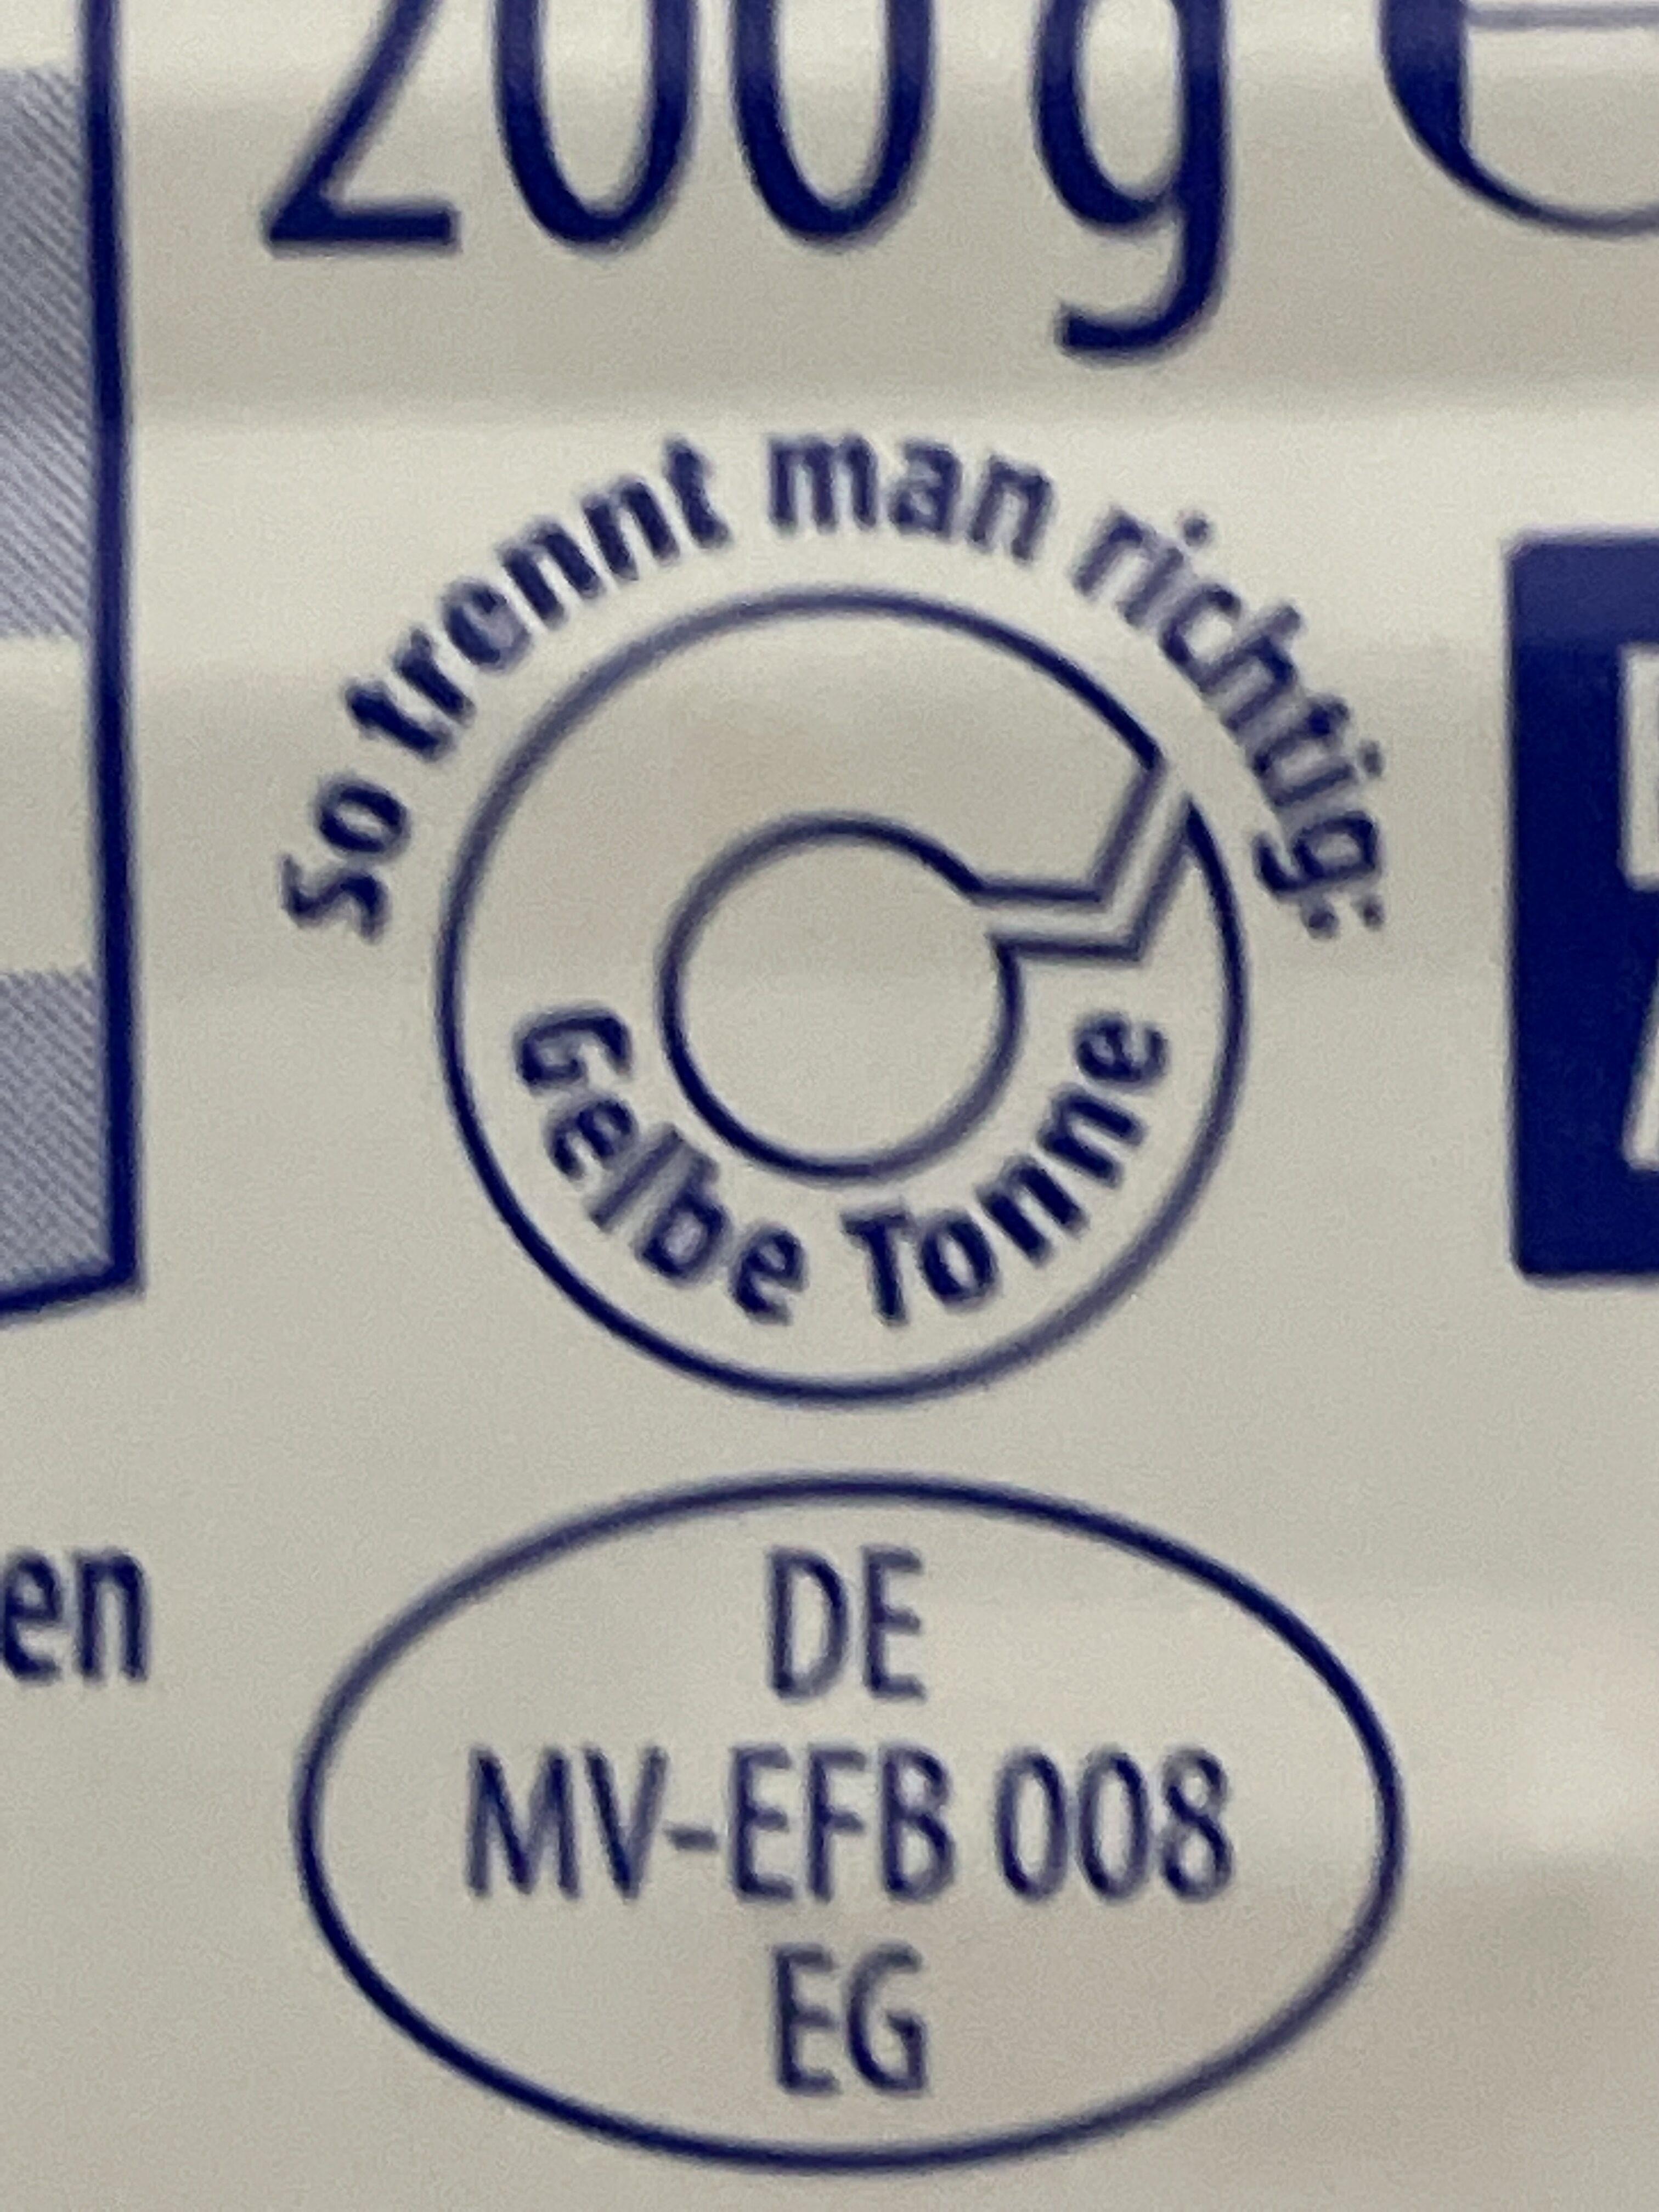 Lachsfilet in herzhafter Tomatensauce - Instruction de recyclage et/ou informations d'emballage - de